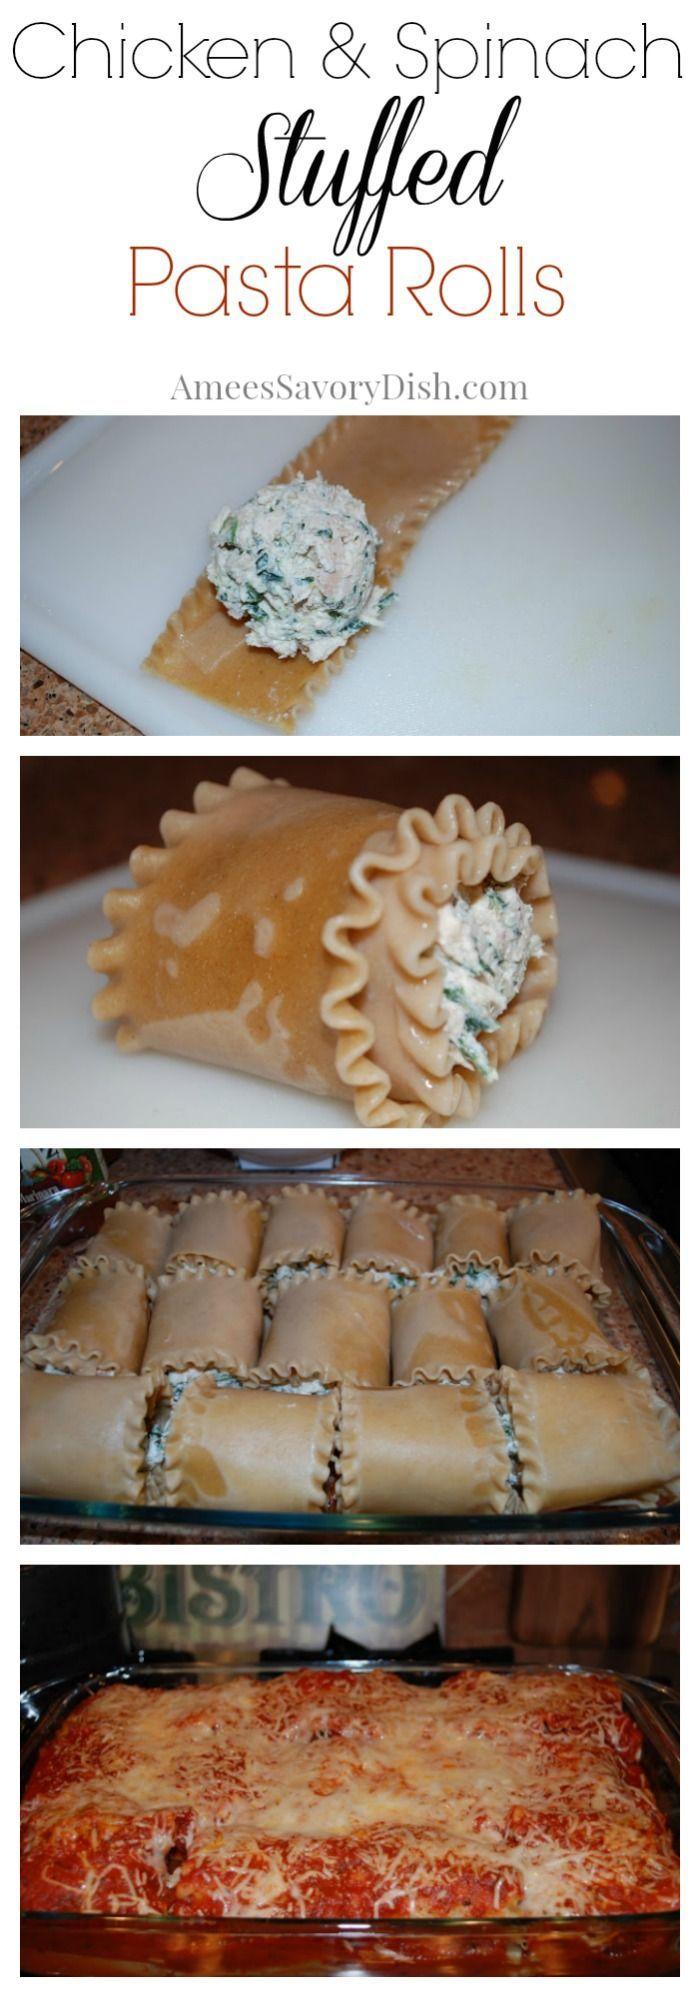 Chicken and Spinach Stuffed Pasta Rolls recipe